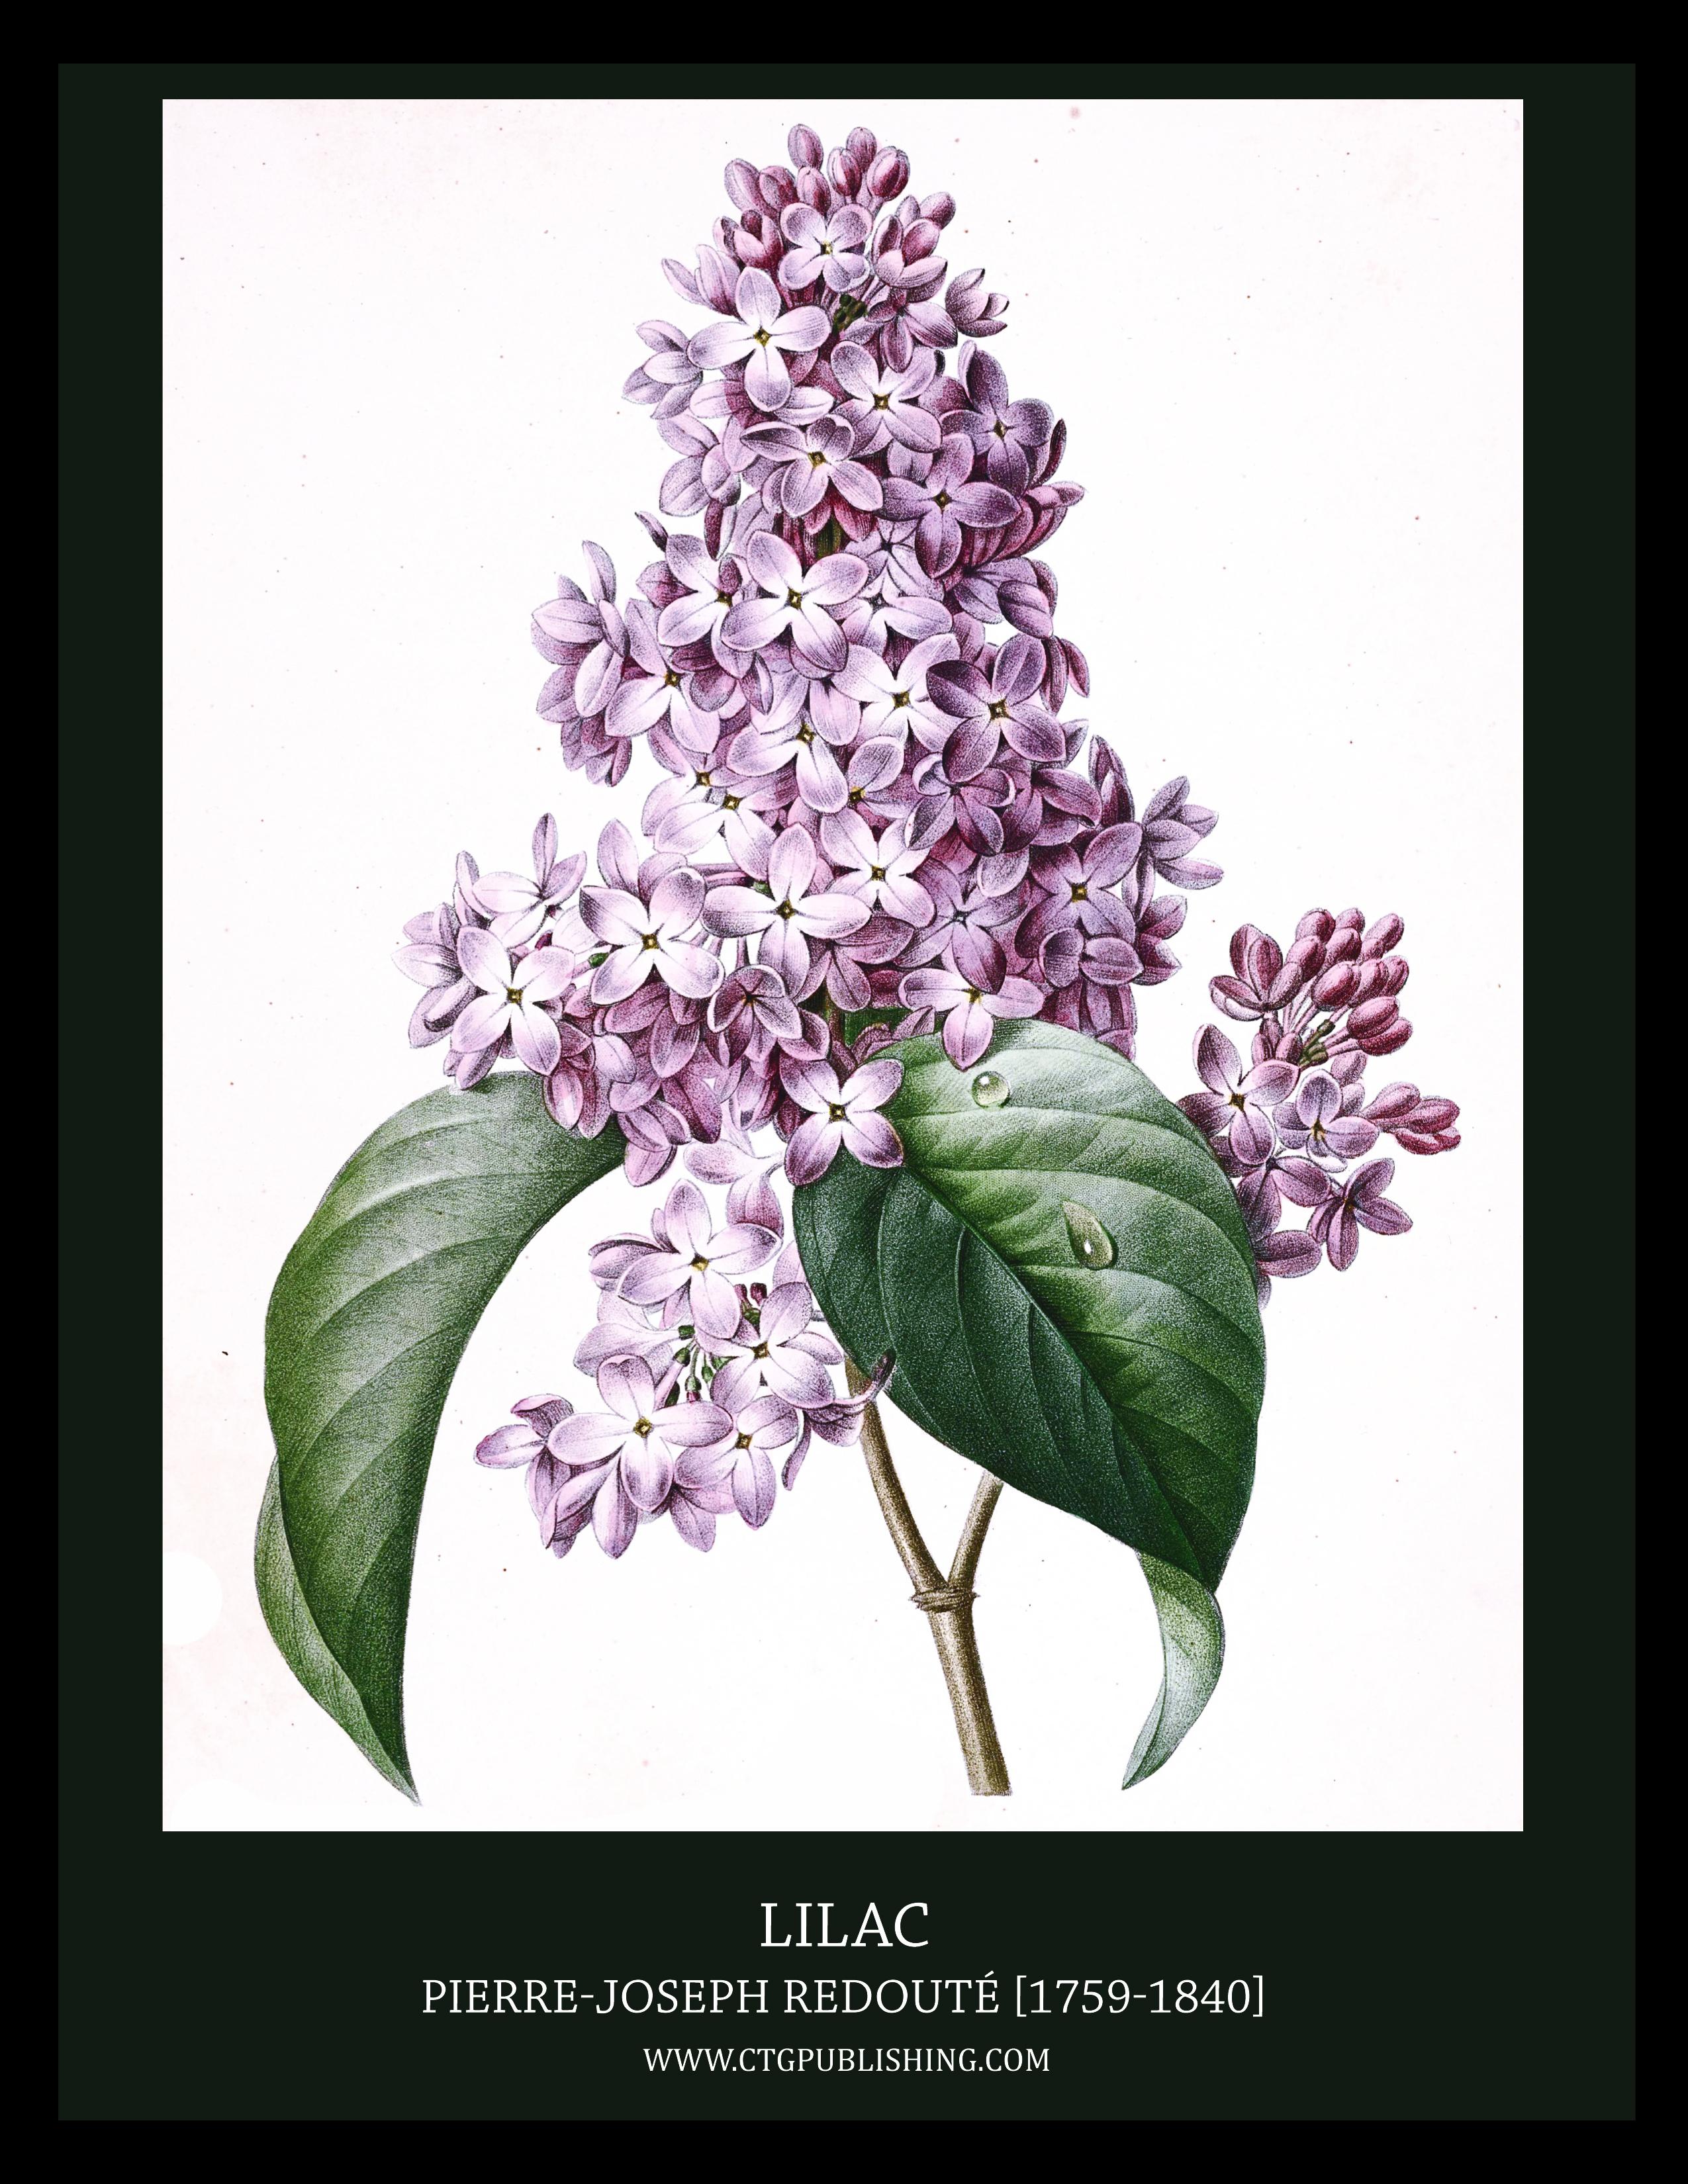 2550x3300 Lilac Illustration By Pierre Joseph Redoute.jpg